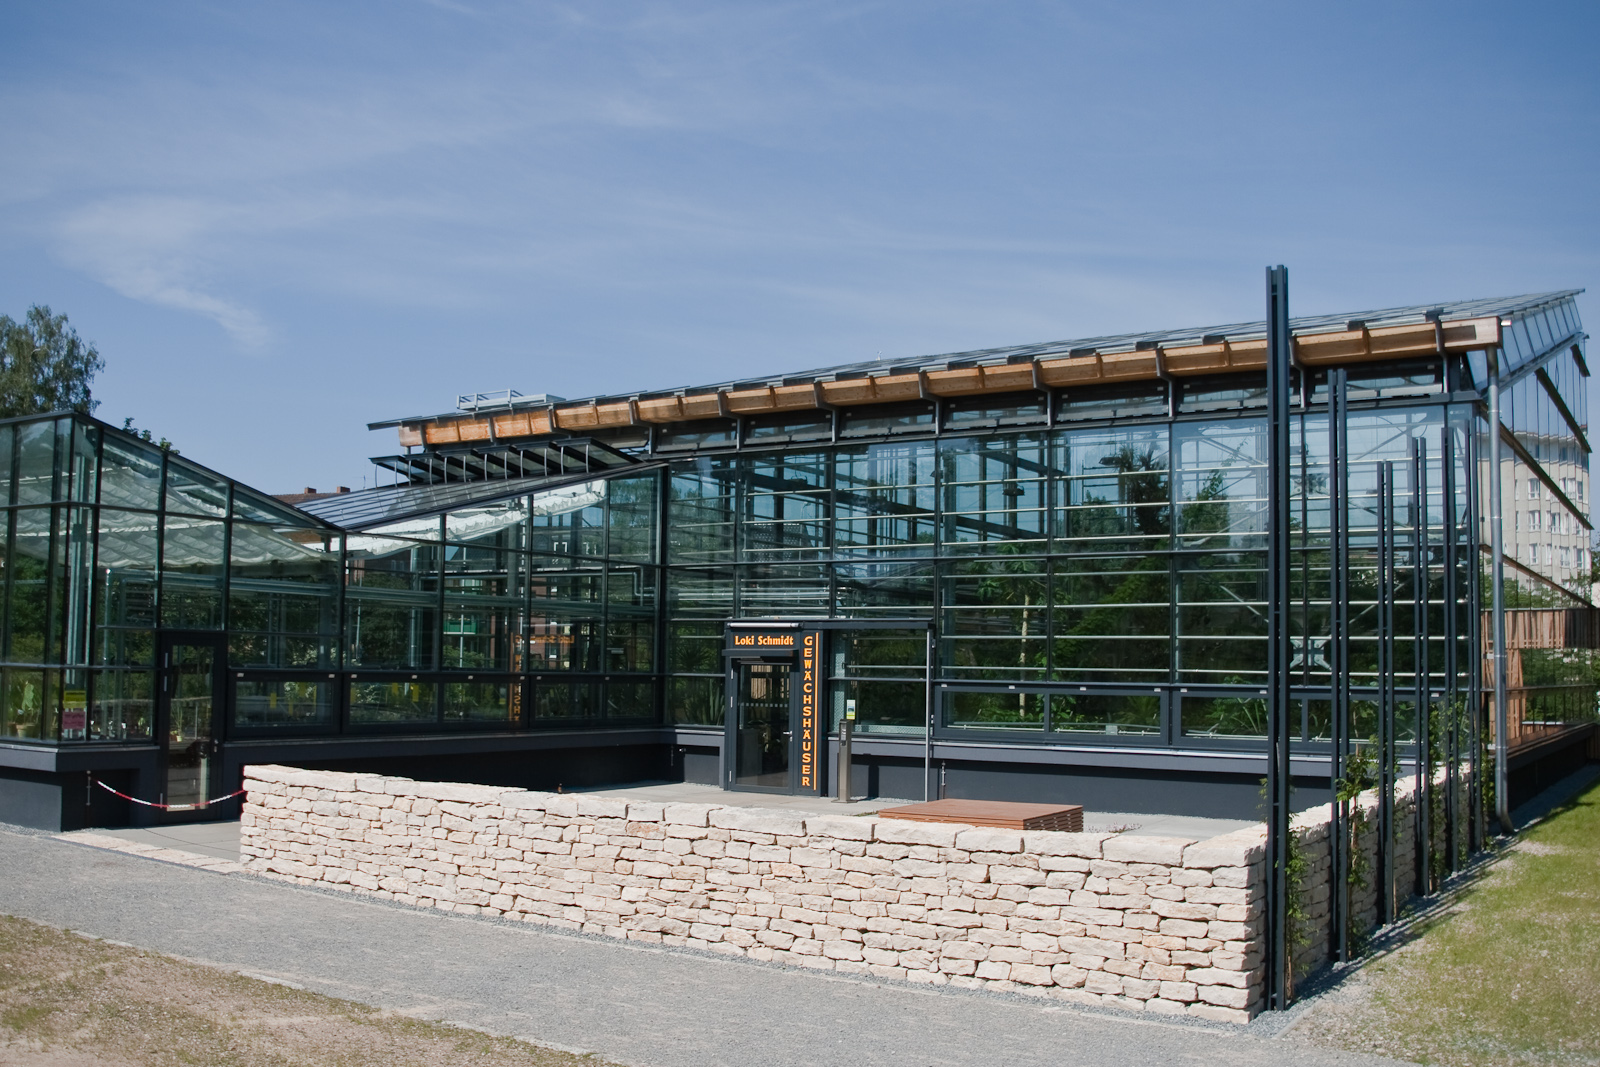 Garten Rostock file botanischer garten rostock loki schmidt gewächshaus eingang jpg